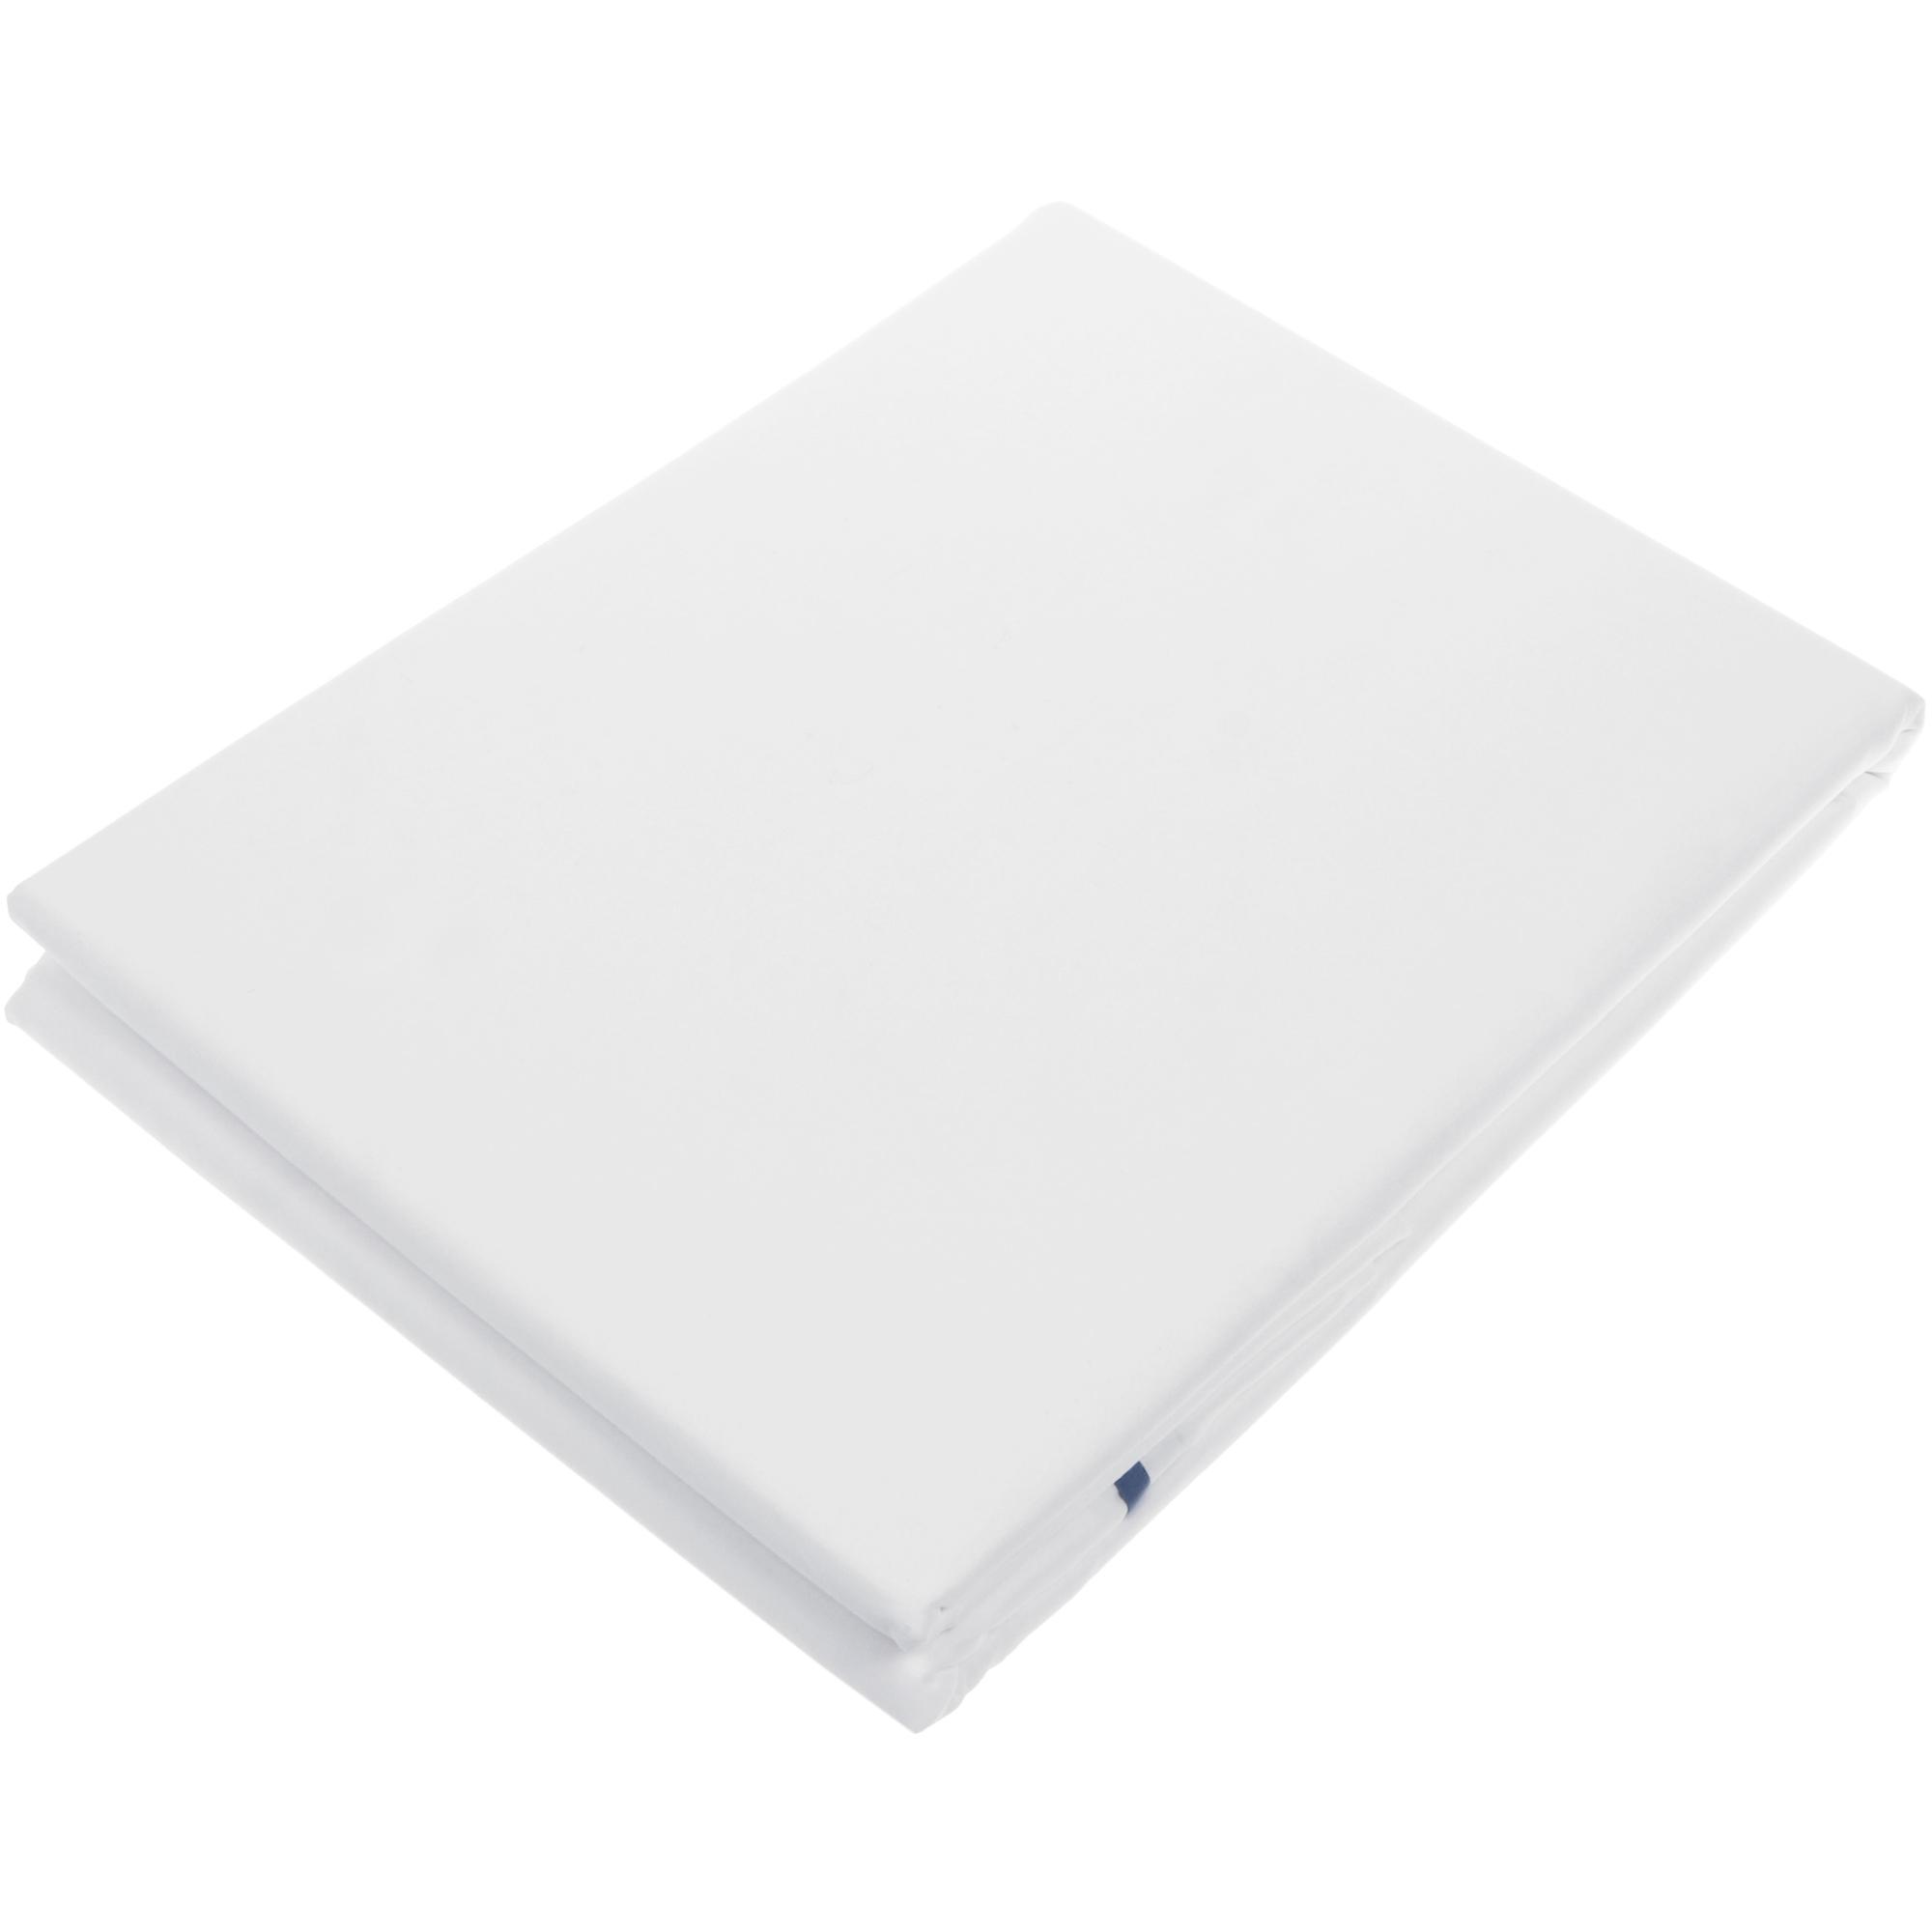 Фото - Пододеяльник Togas Плаза белый с синим 145х200 см пододеяльник togas плаза белый коричневый 220х240 см